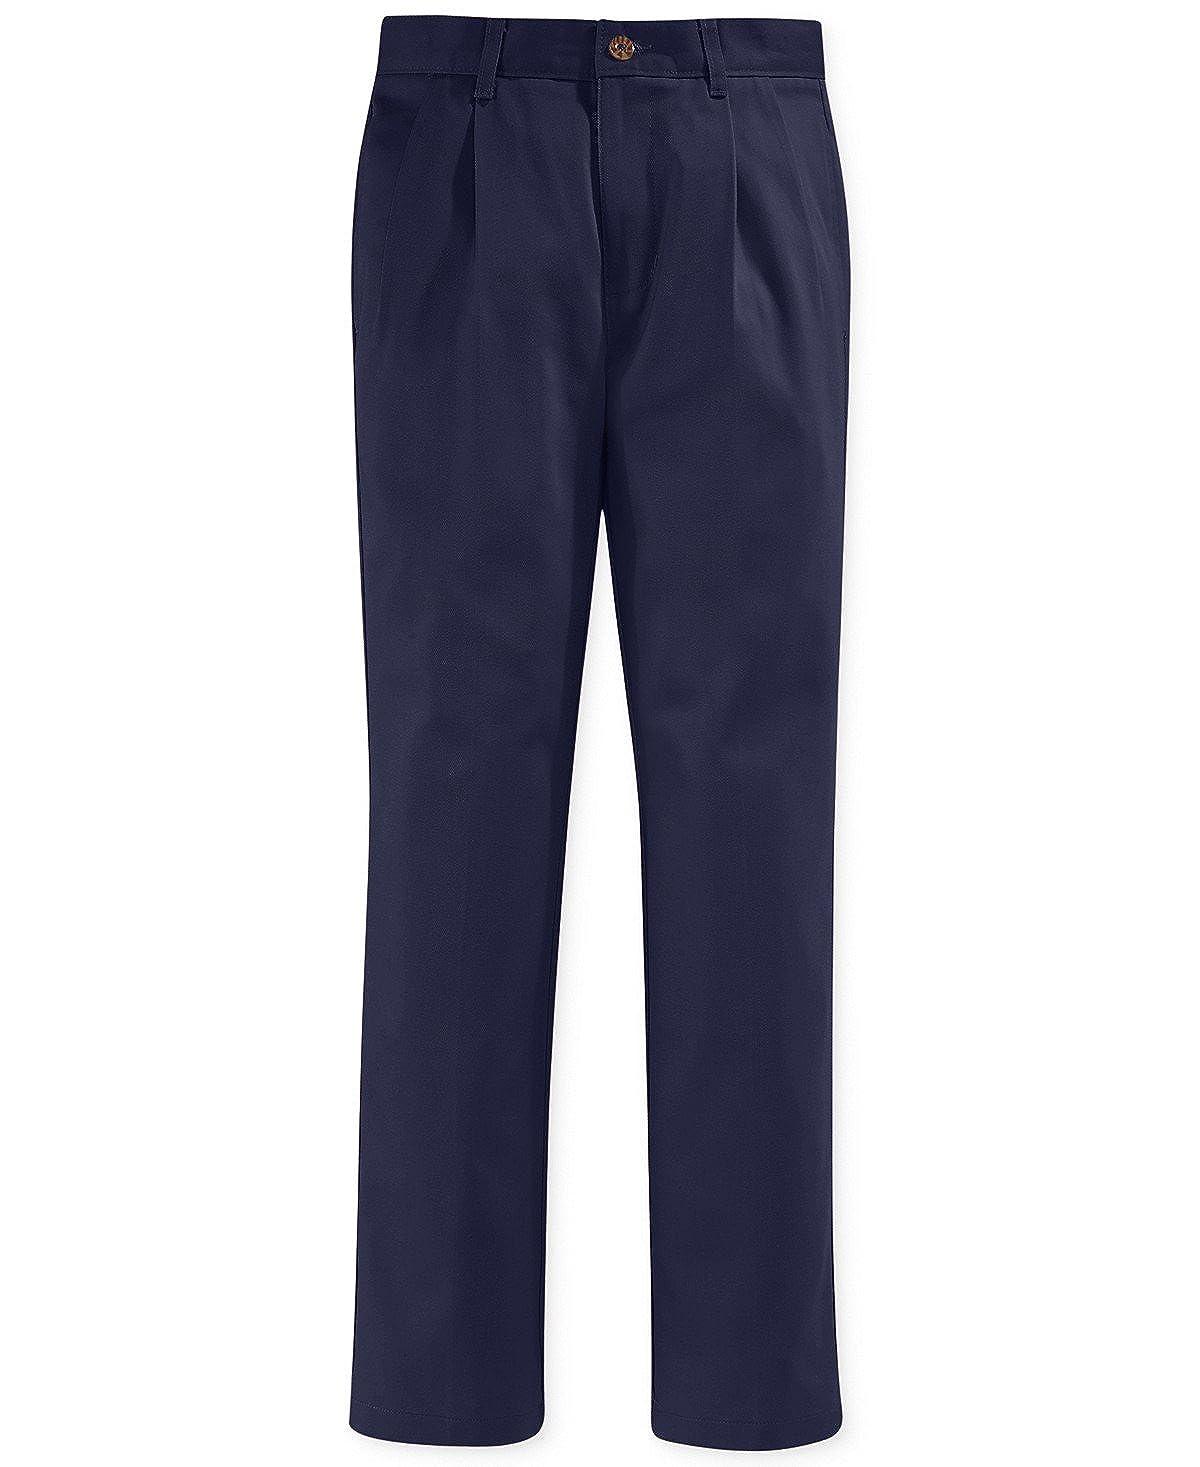 Big Boys Nautica Pleated School Uniform Pants